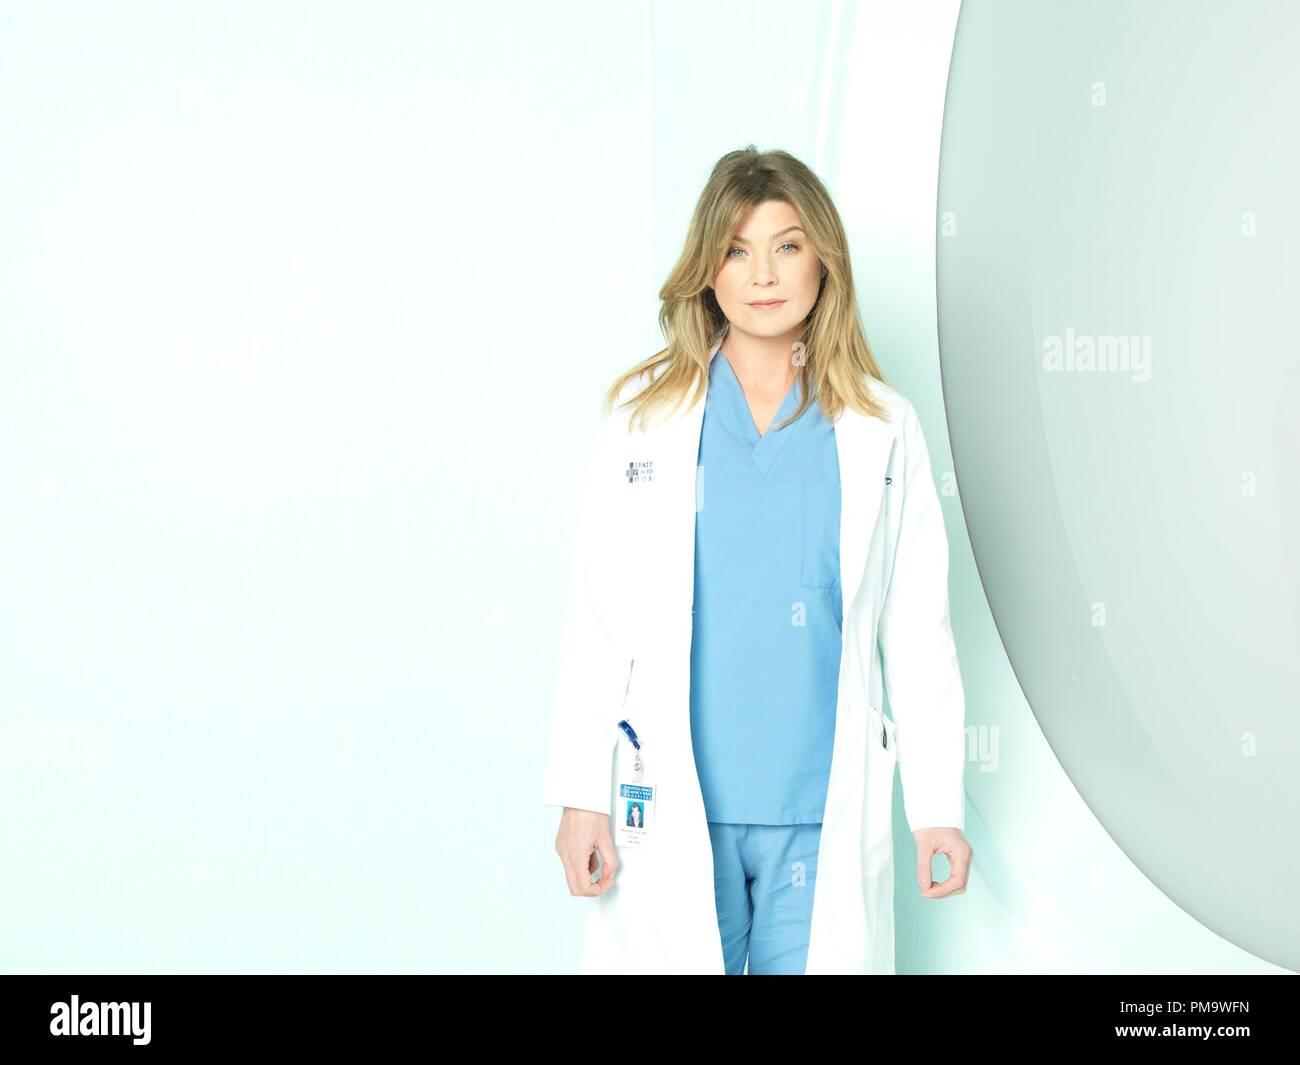 Greys Anatomy Abcs Greys Anatomy Stars Ellen Pompeo As